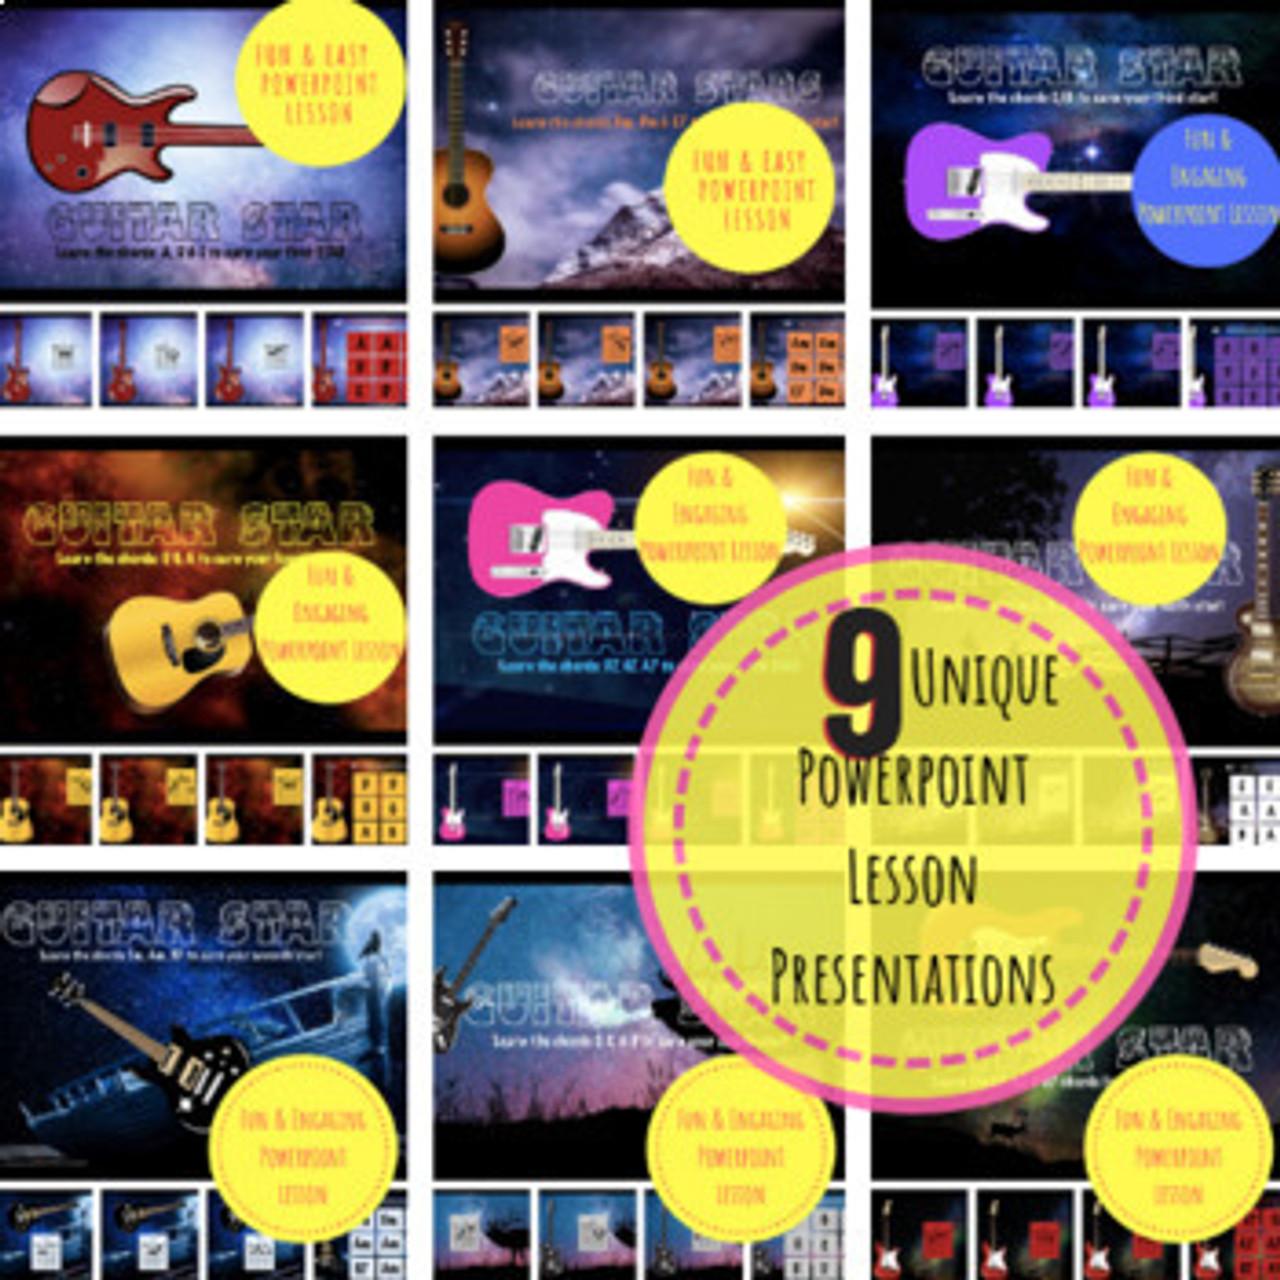 GUITAR STAR! Curriculum - Lessons 1-9